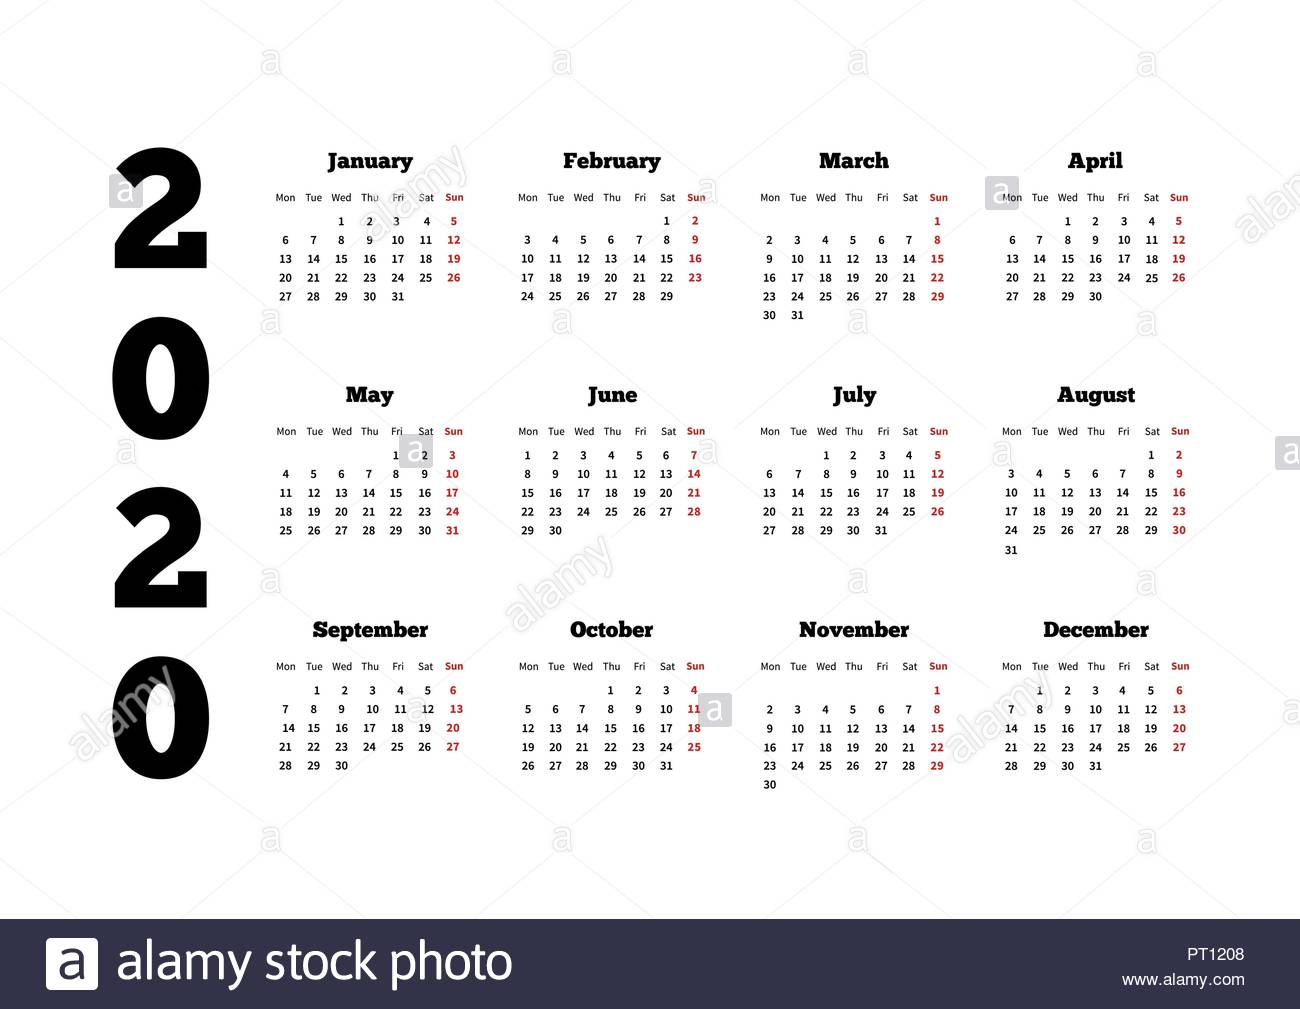 Calendar On 2020 Year With Week Starting From Monday, A4 Sheet Stock regarding 2020 Calendar Starting On Monday